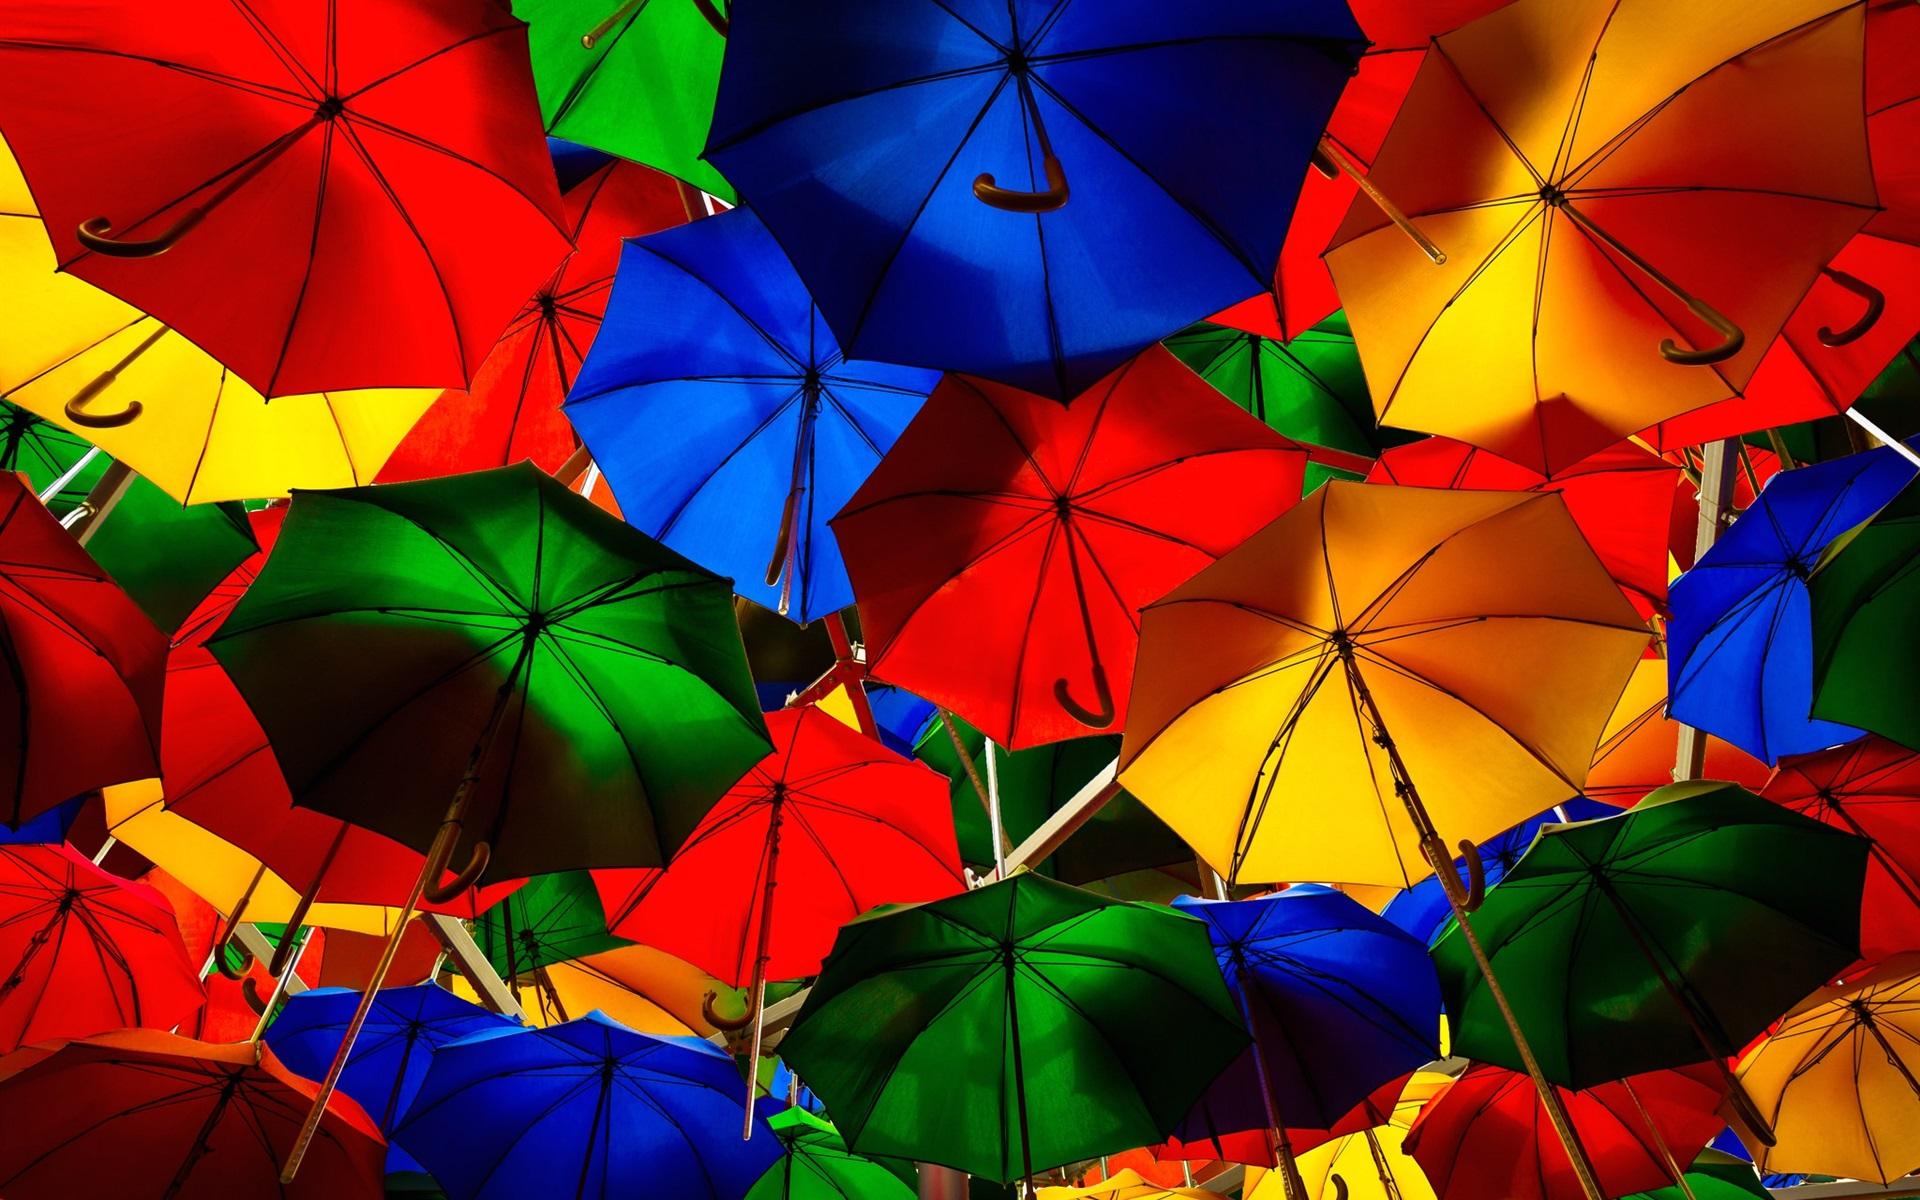 Fondos De Pantalla Paraguas De Colores, Calle 1920x1200 HD